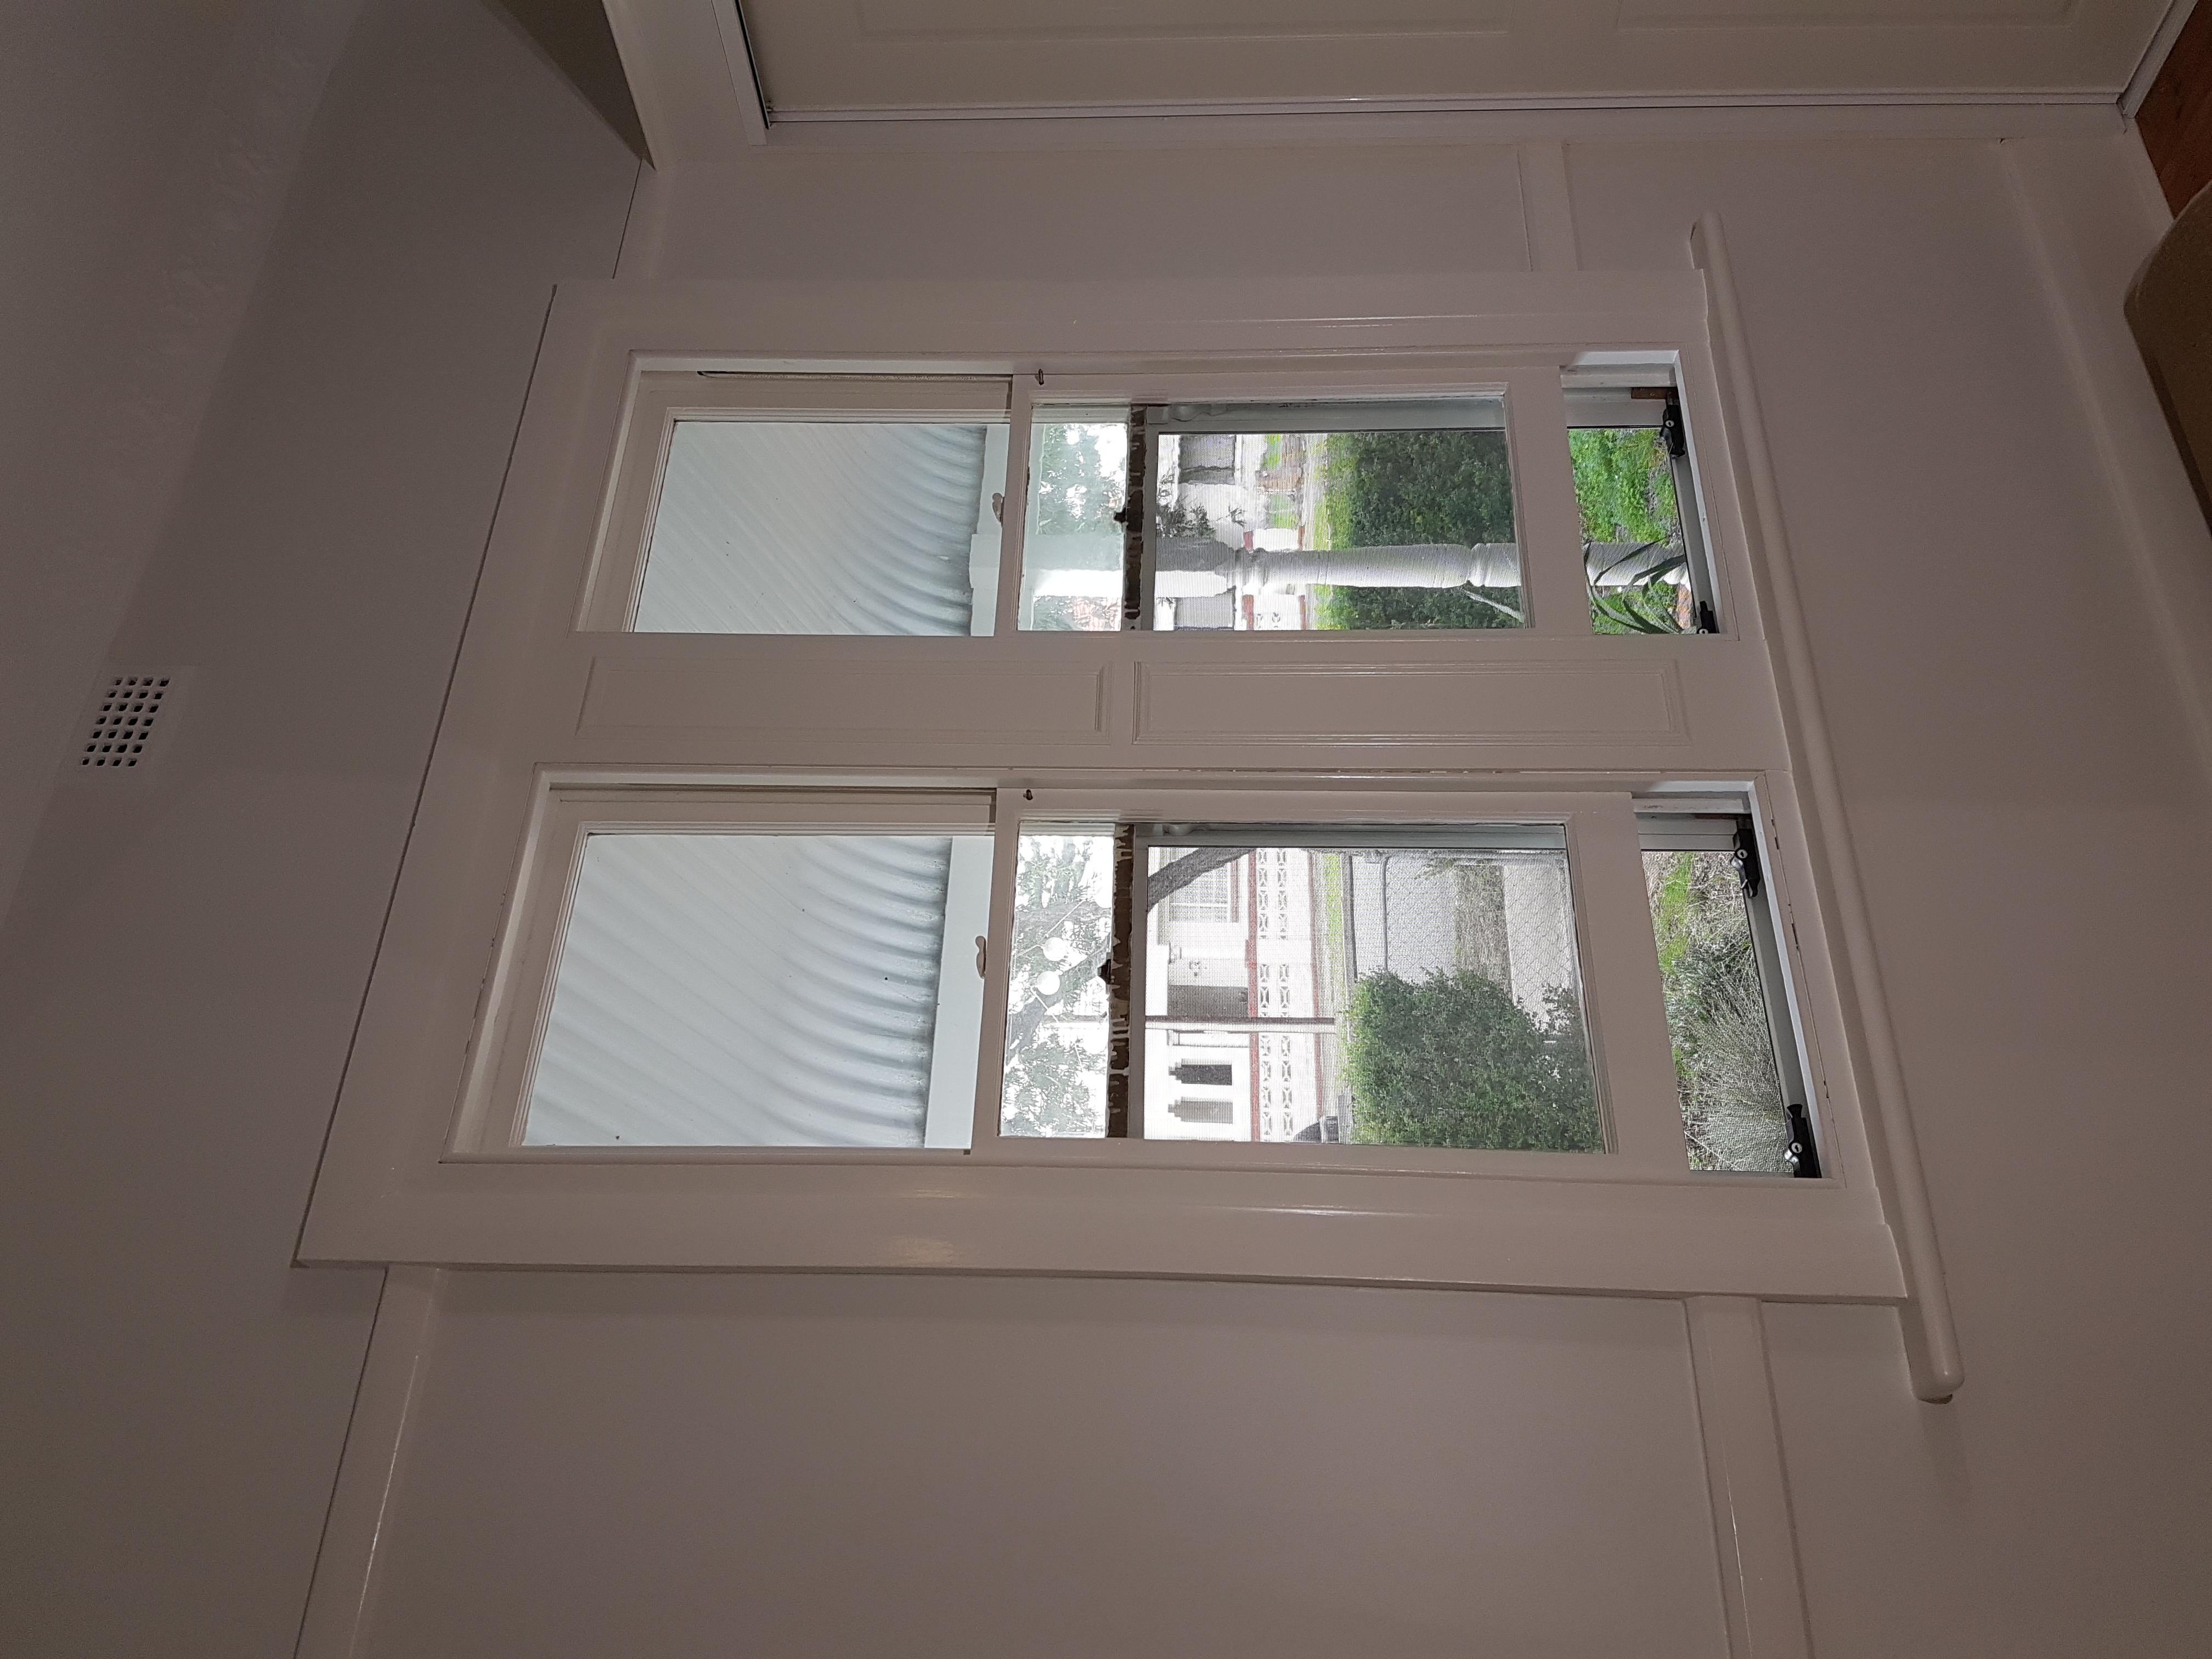 Freshly painted window